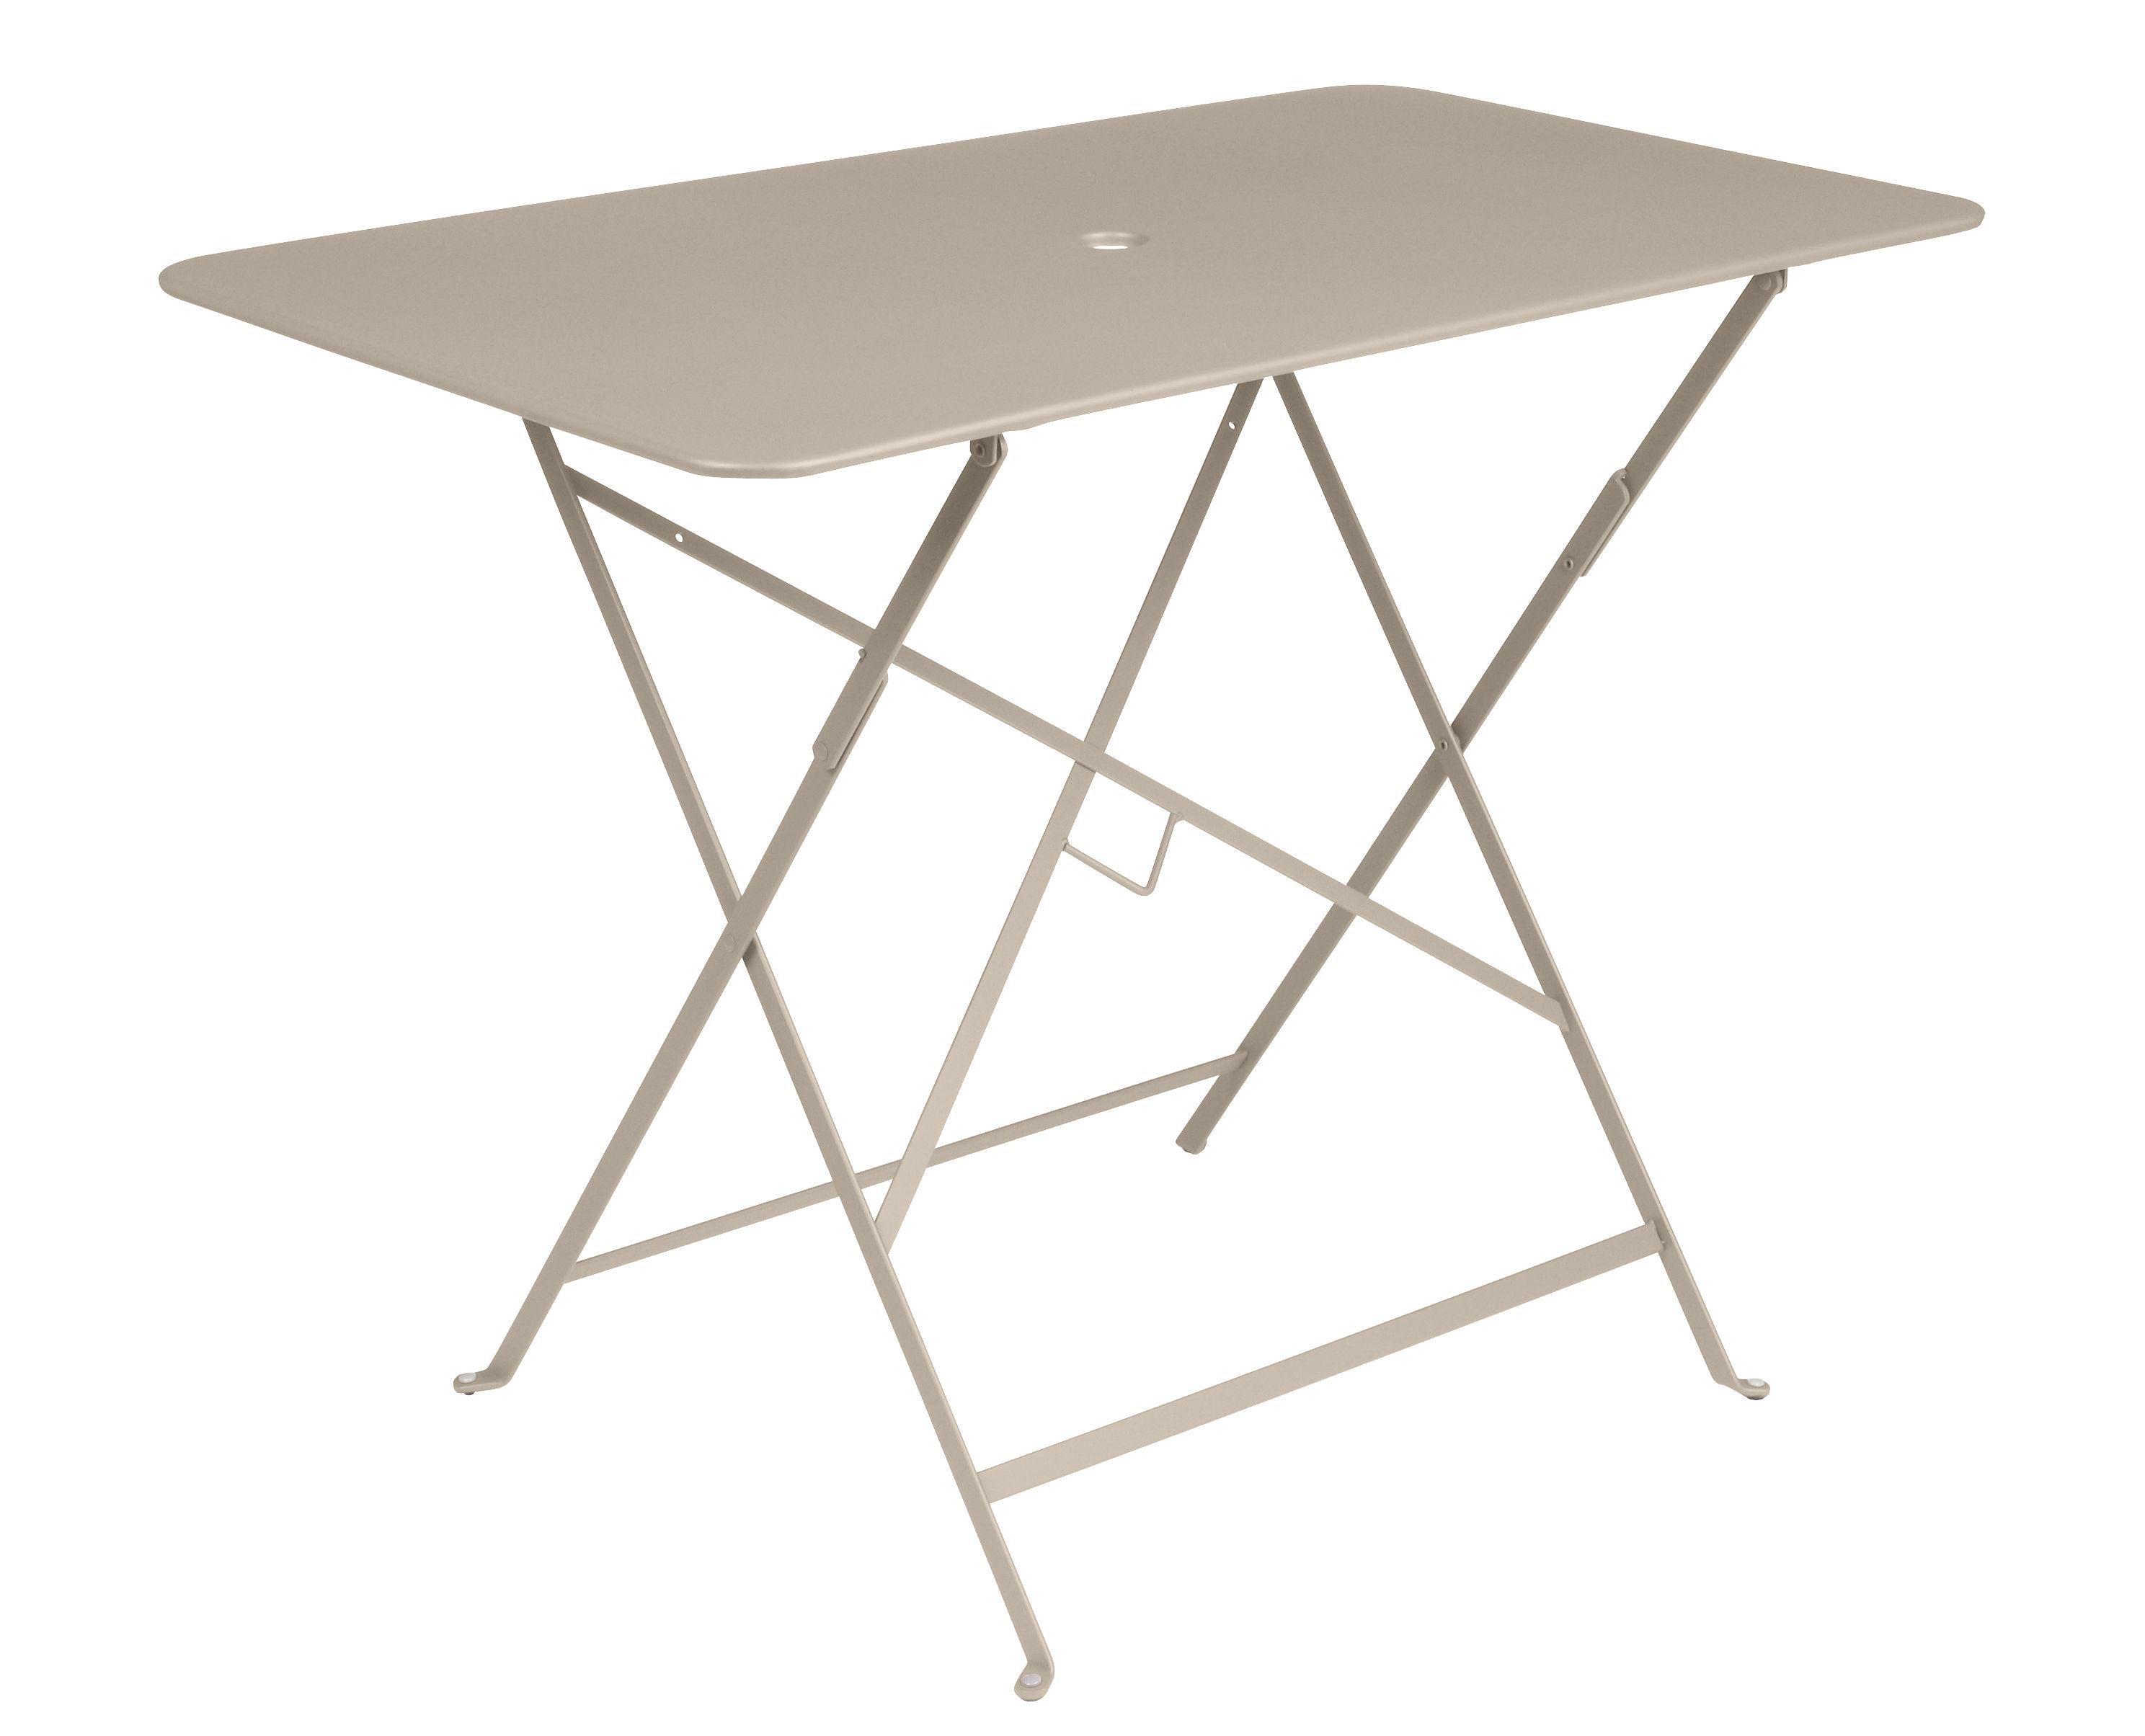 table pliante bistro 97 x 57 cm 4 personnes trou parasol muscade fermob. Black Bedroom Furniture Sets. Home Design Ideas